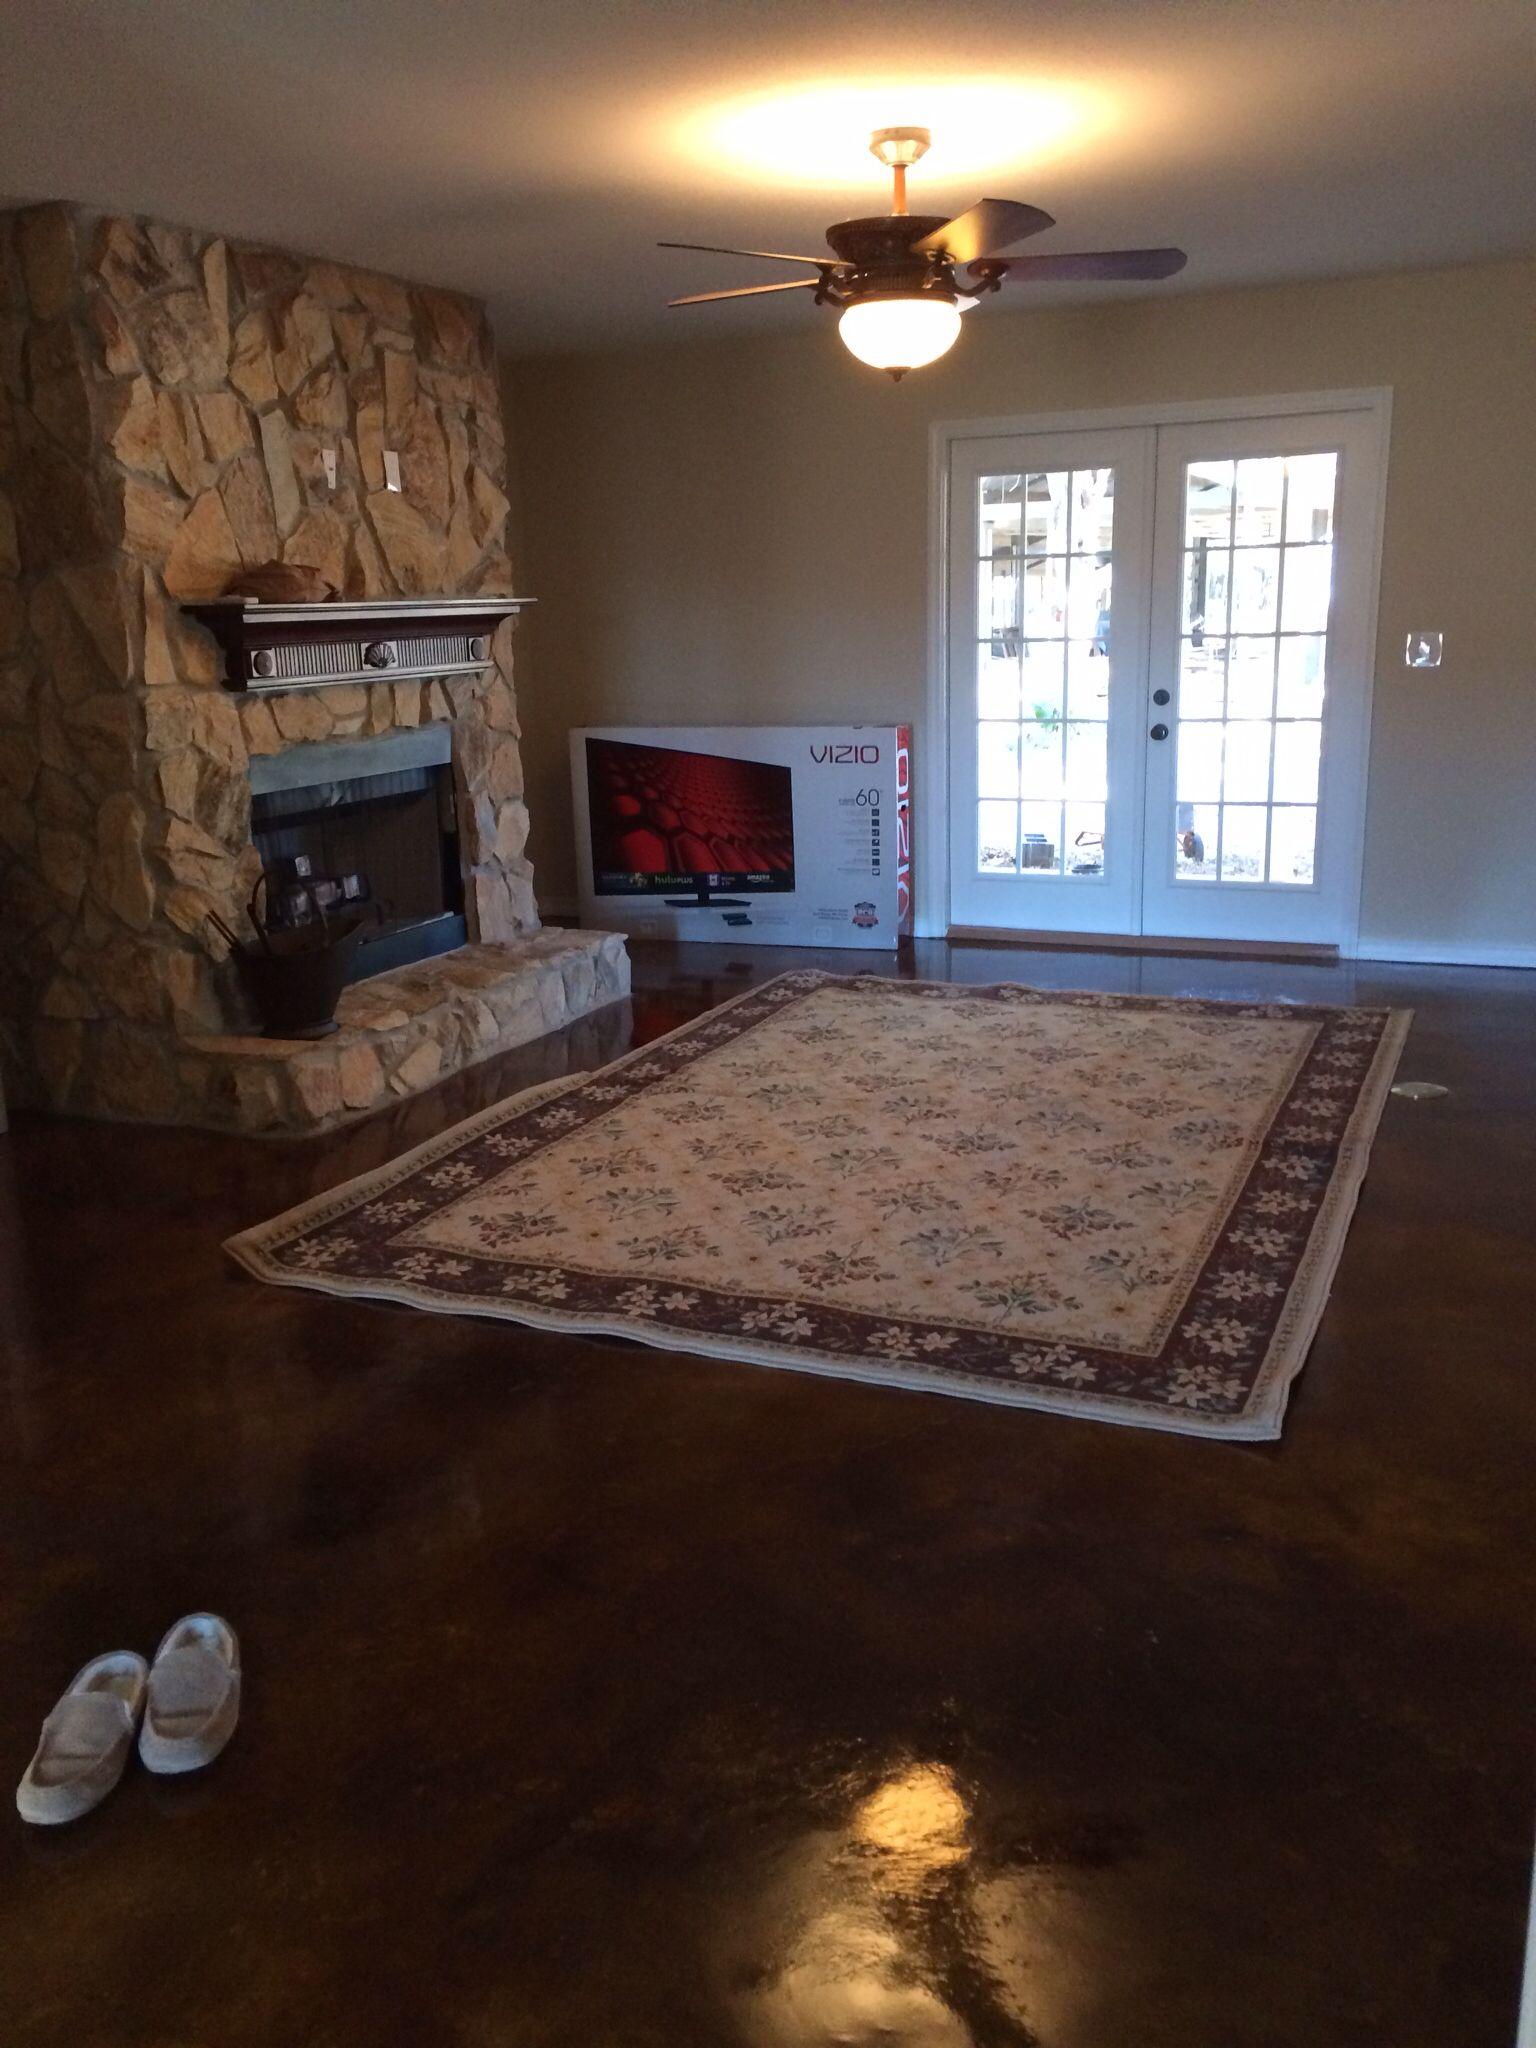 rugs go in